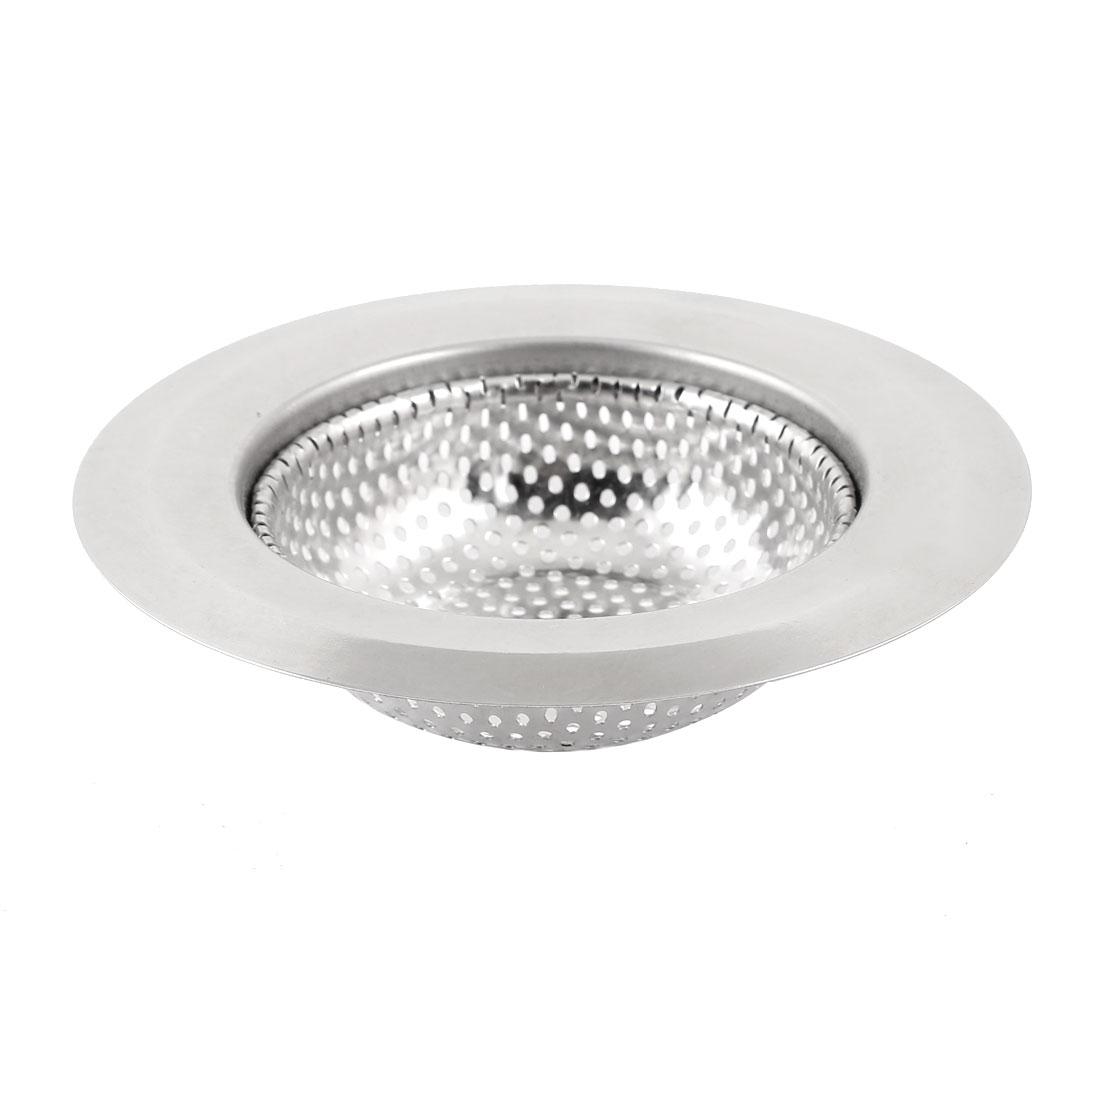 "Washroom 4.3"" Diameter Stainless Steel Basin Filter Sink Drainer Strainer"